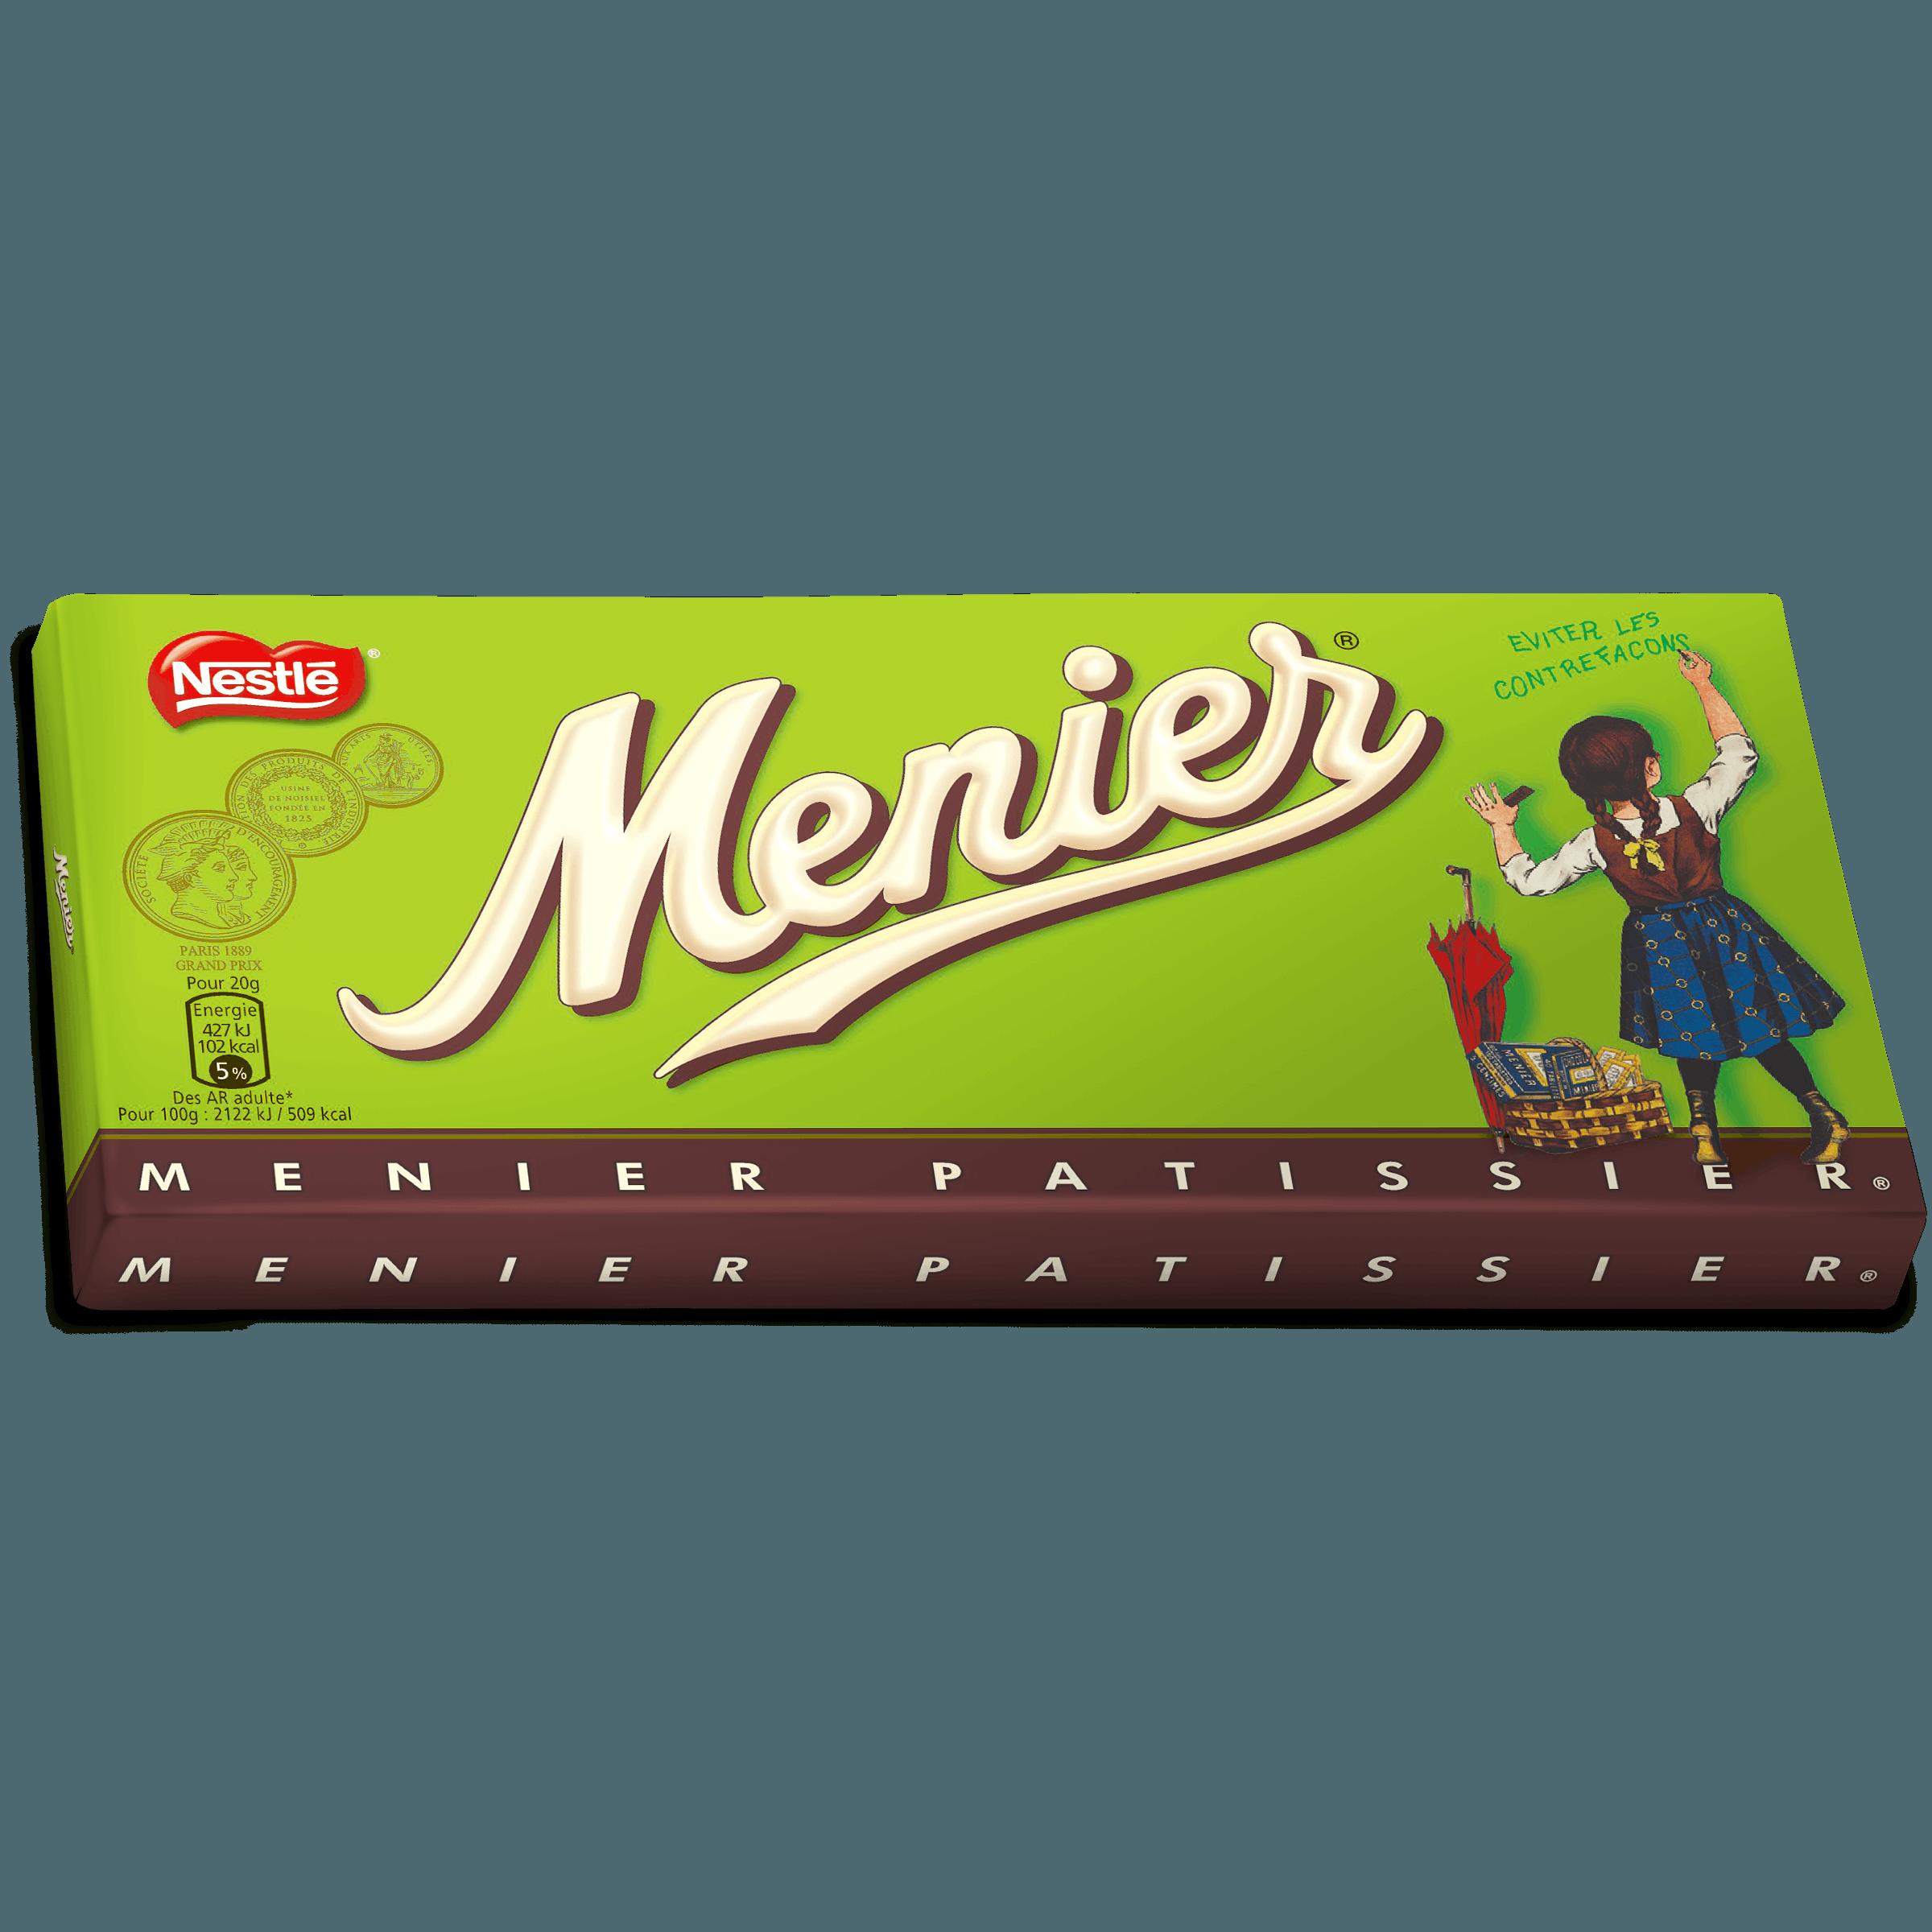 Chocolat pâtissier Menier, Nestlé (200 g)